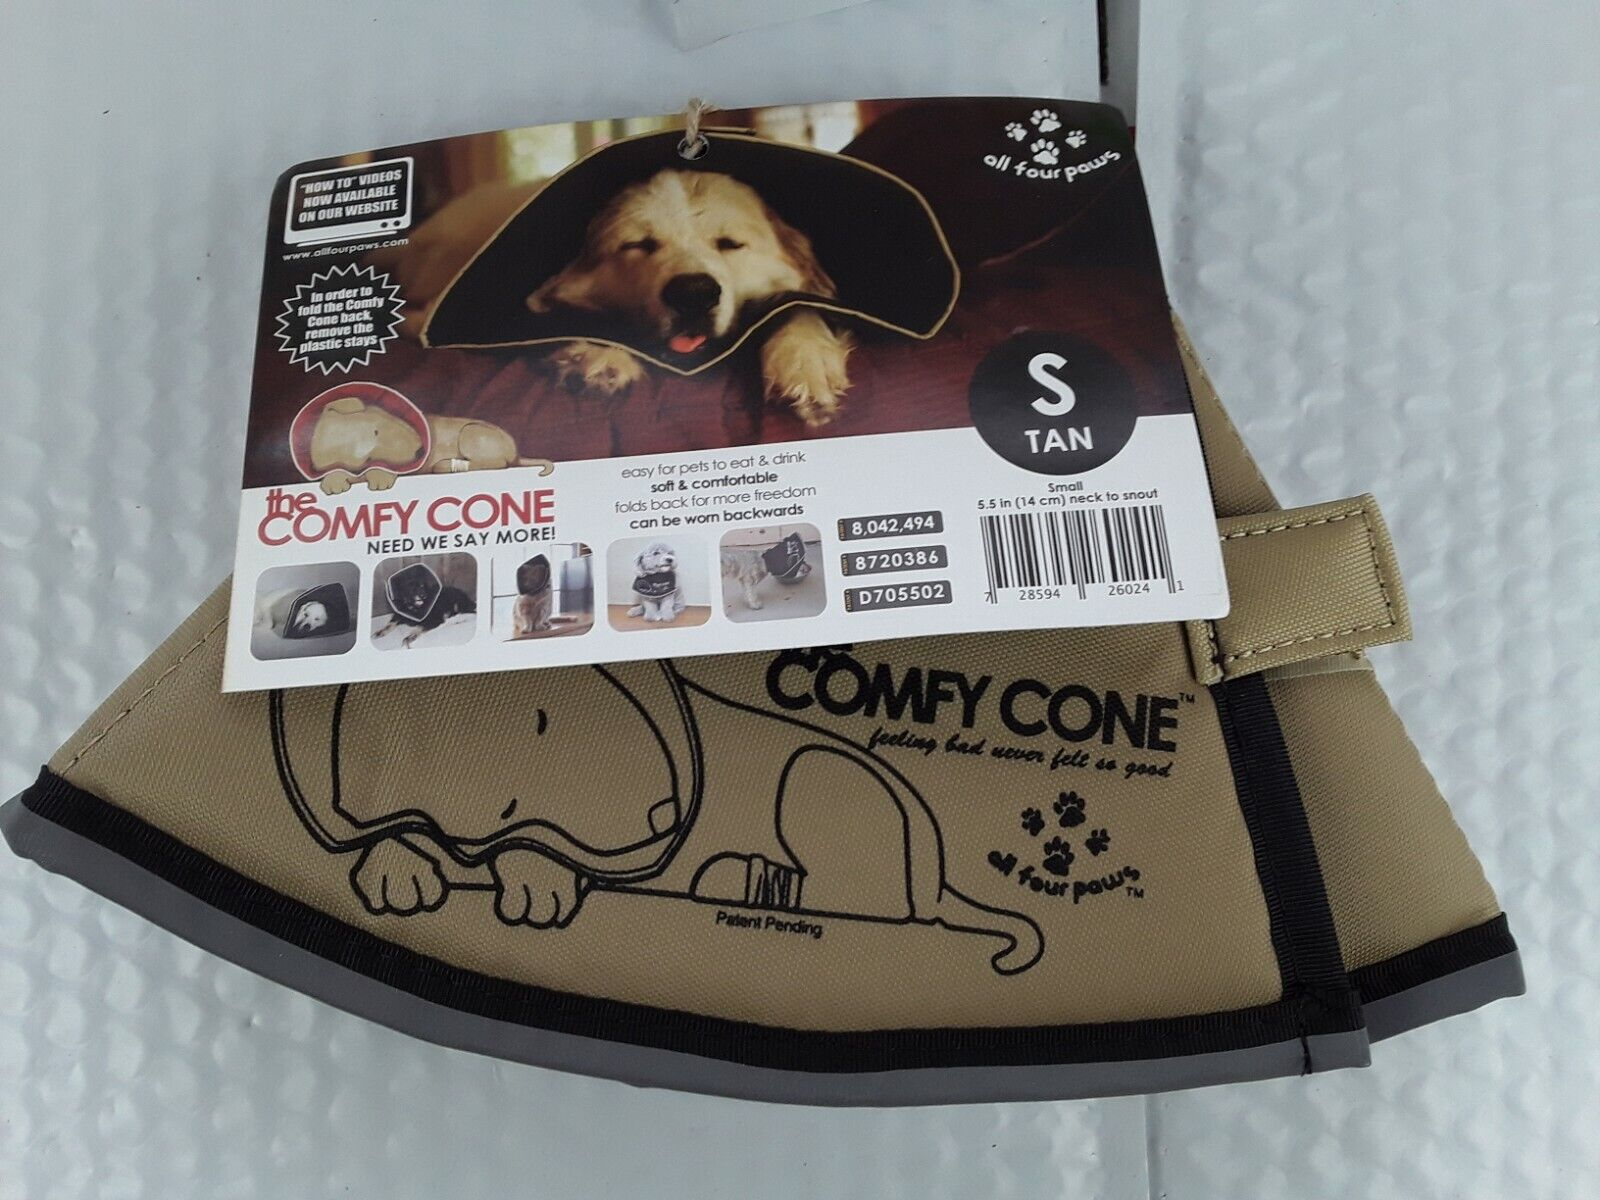 All Four Paws Tan Comfy Cone, Small 12.5 cm